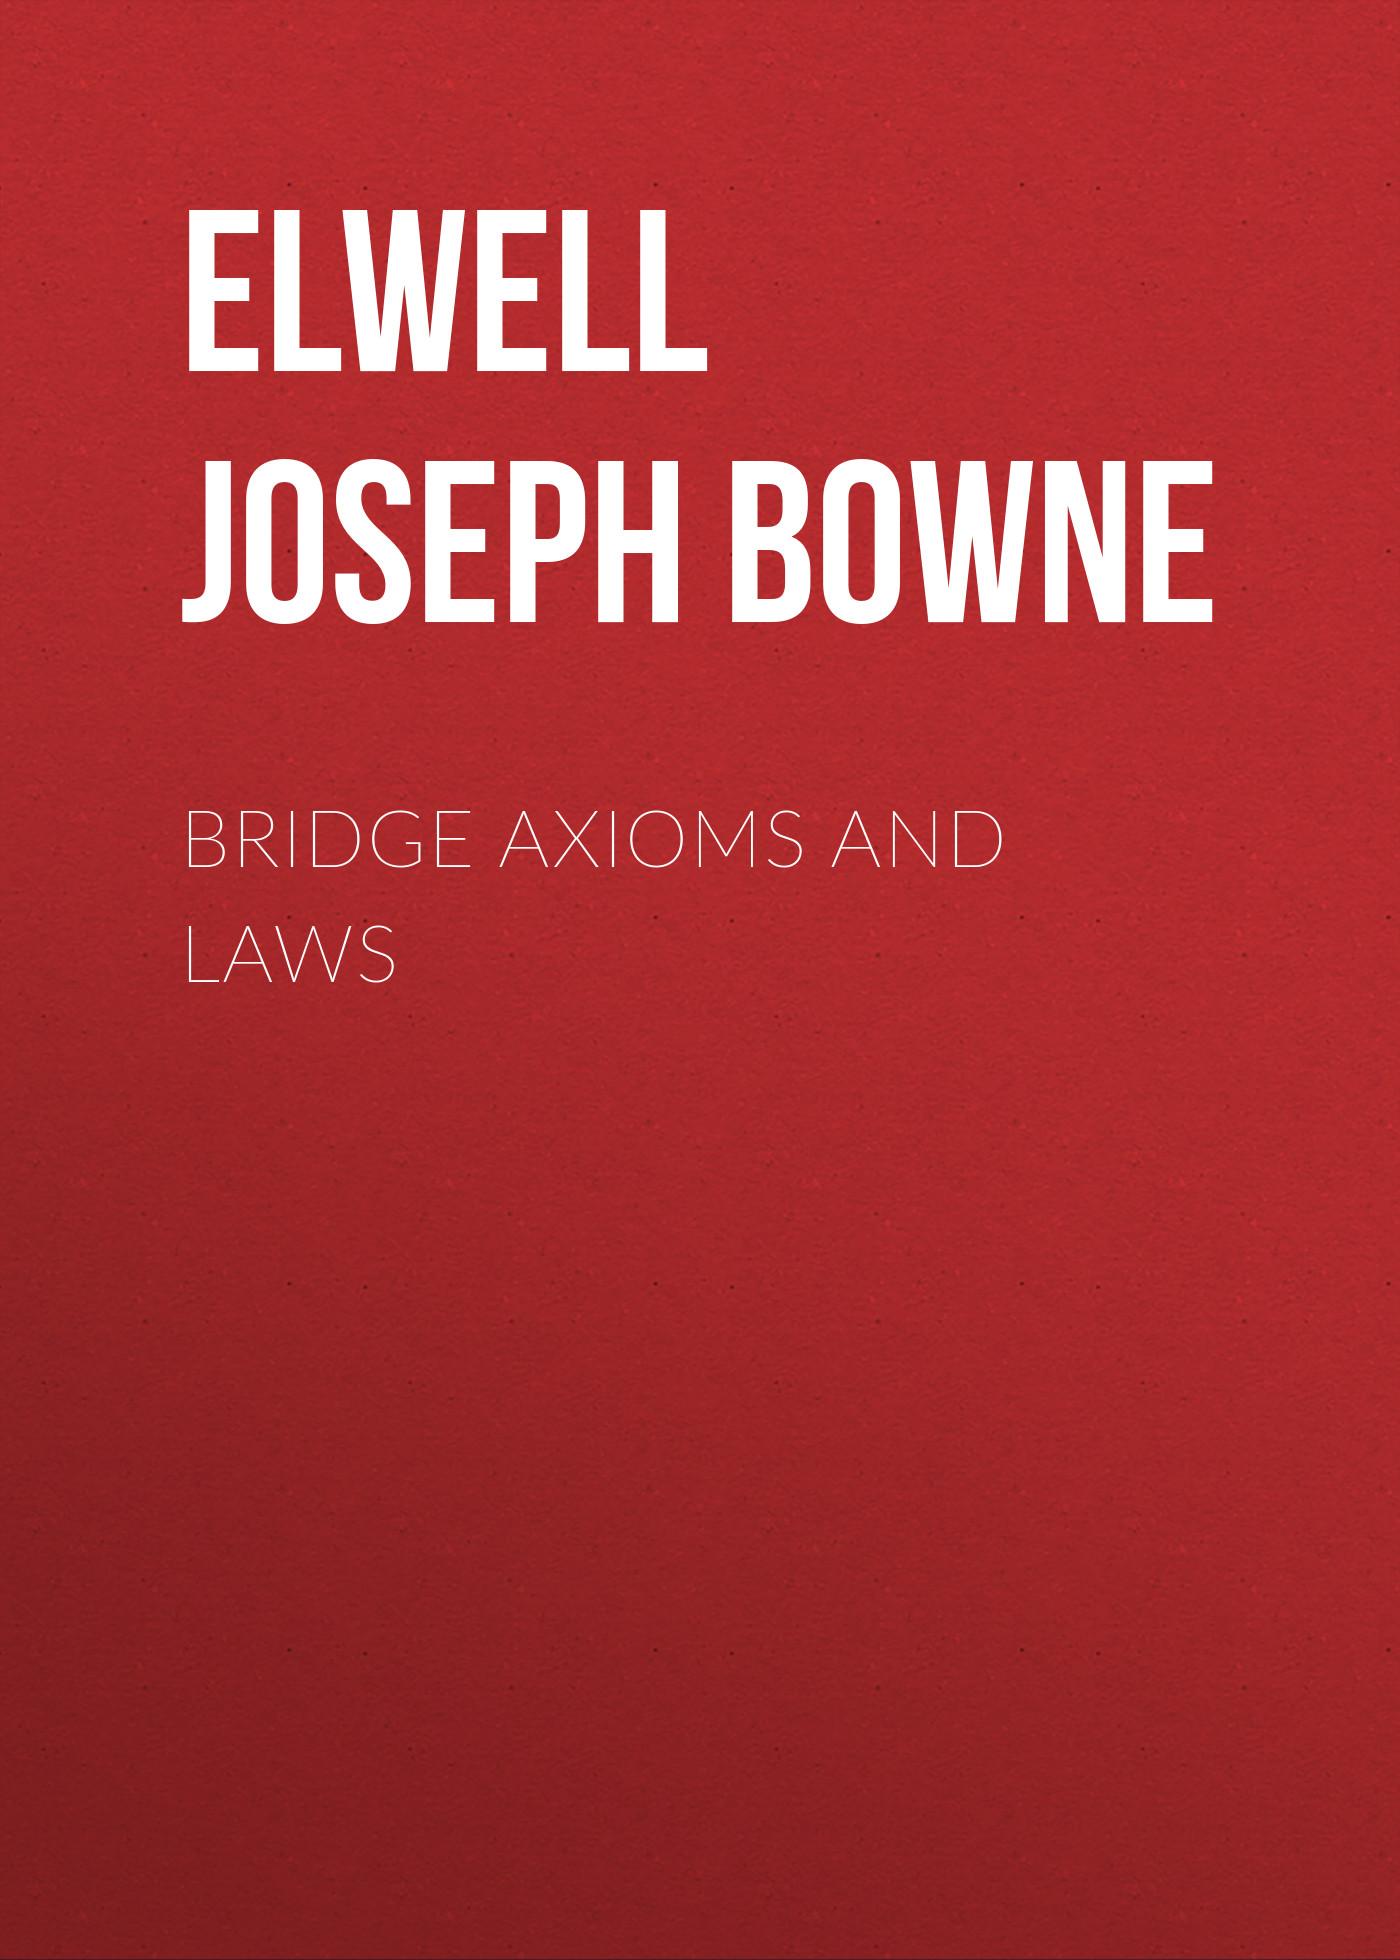 Elwell Joseph Bowne Bridge Axioms and Laws sales 5x6 string acoustic guitar bone bridge saddle and nut and 6pcs ebony guitar bridge pins white black